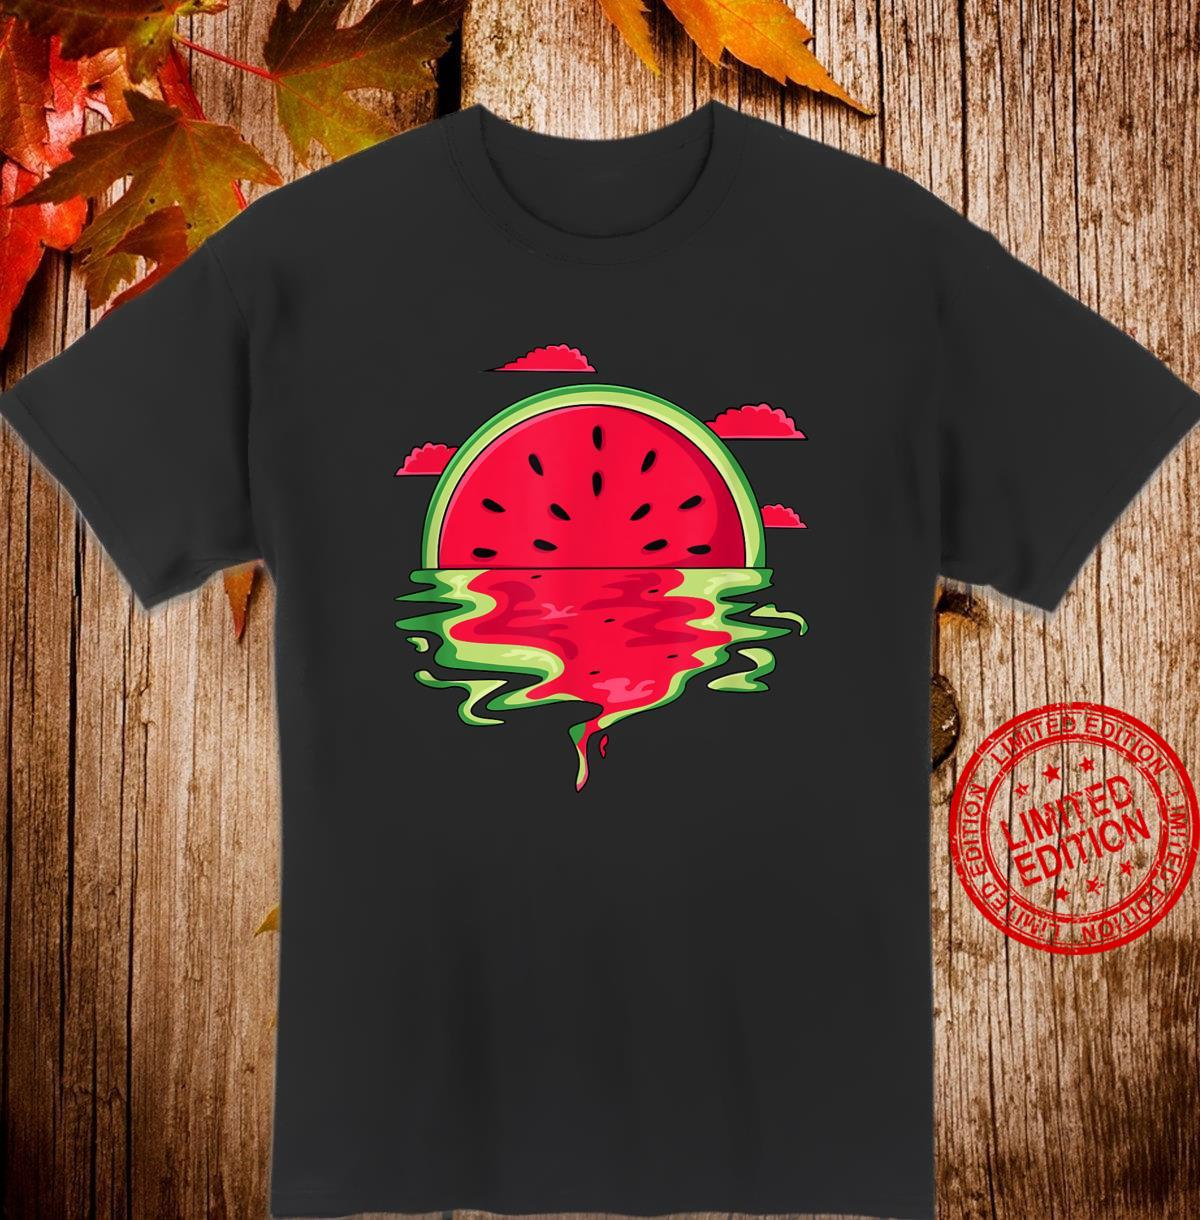 Funny Watermelon Vaporwave Sunset Summer Tropical Shirt